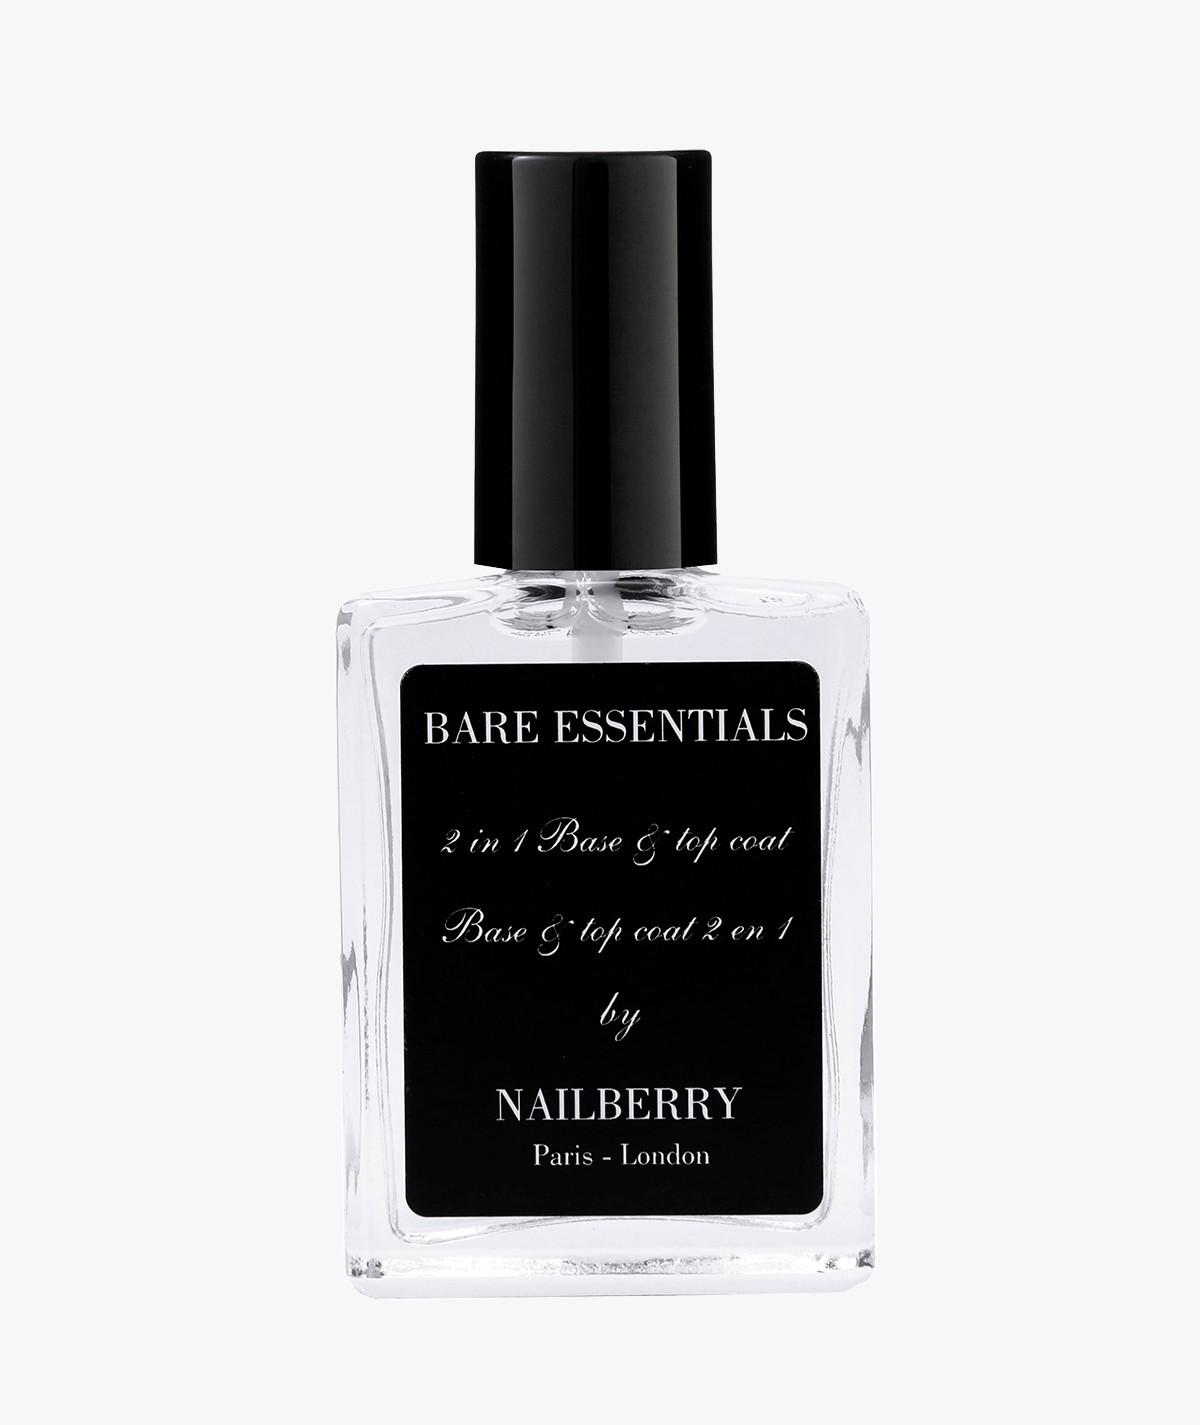 Nailberry Bare Essentials